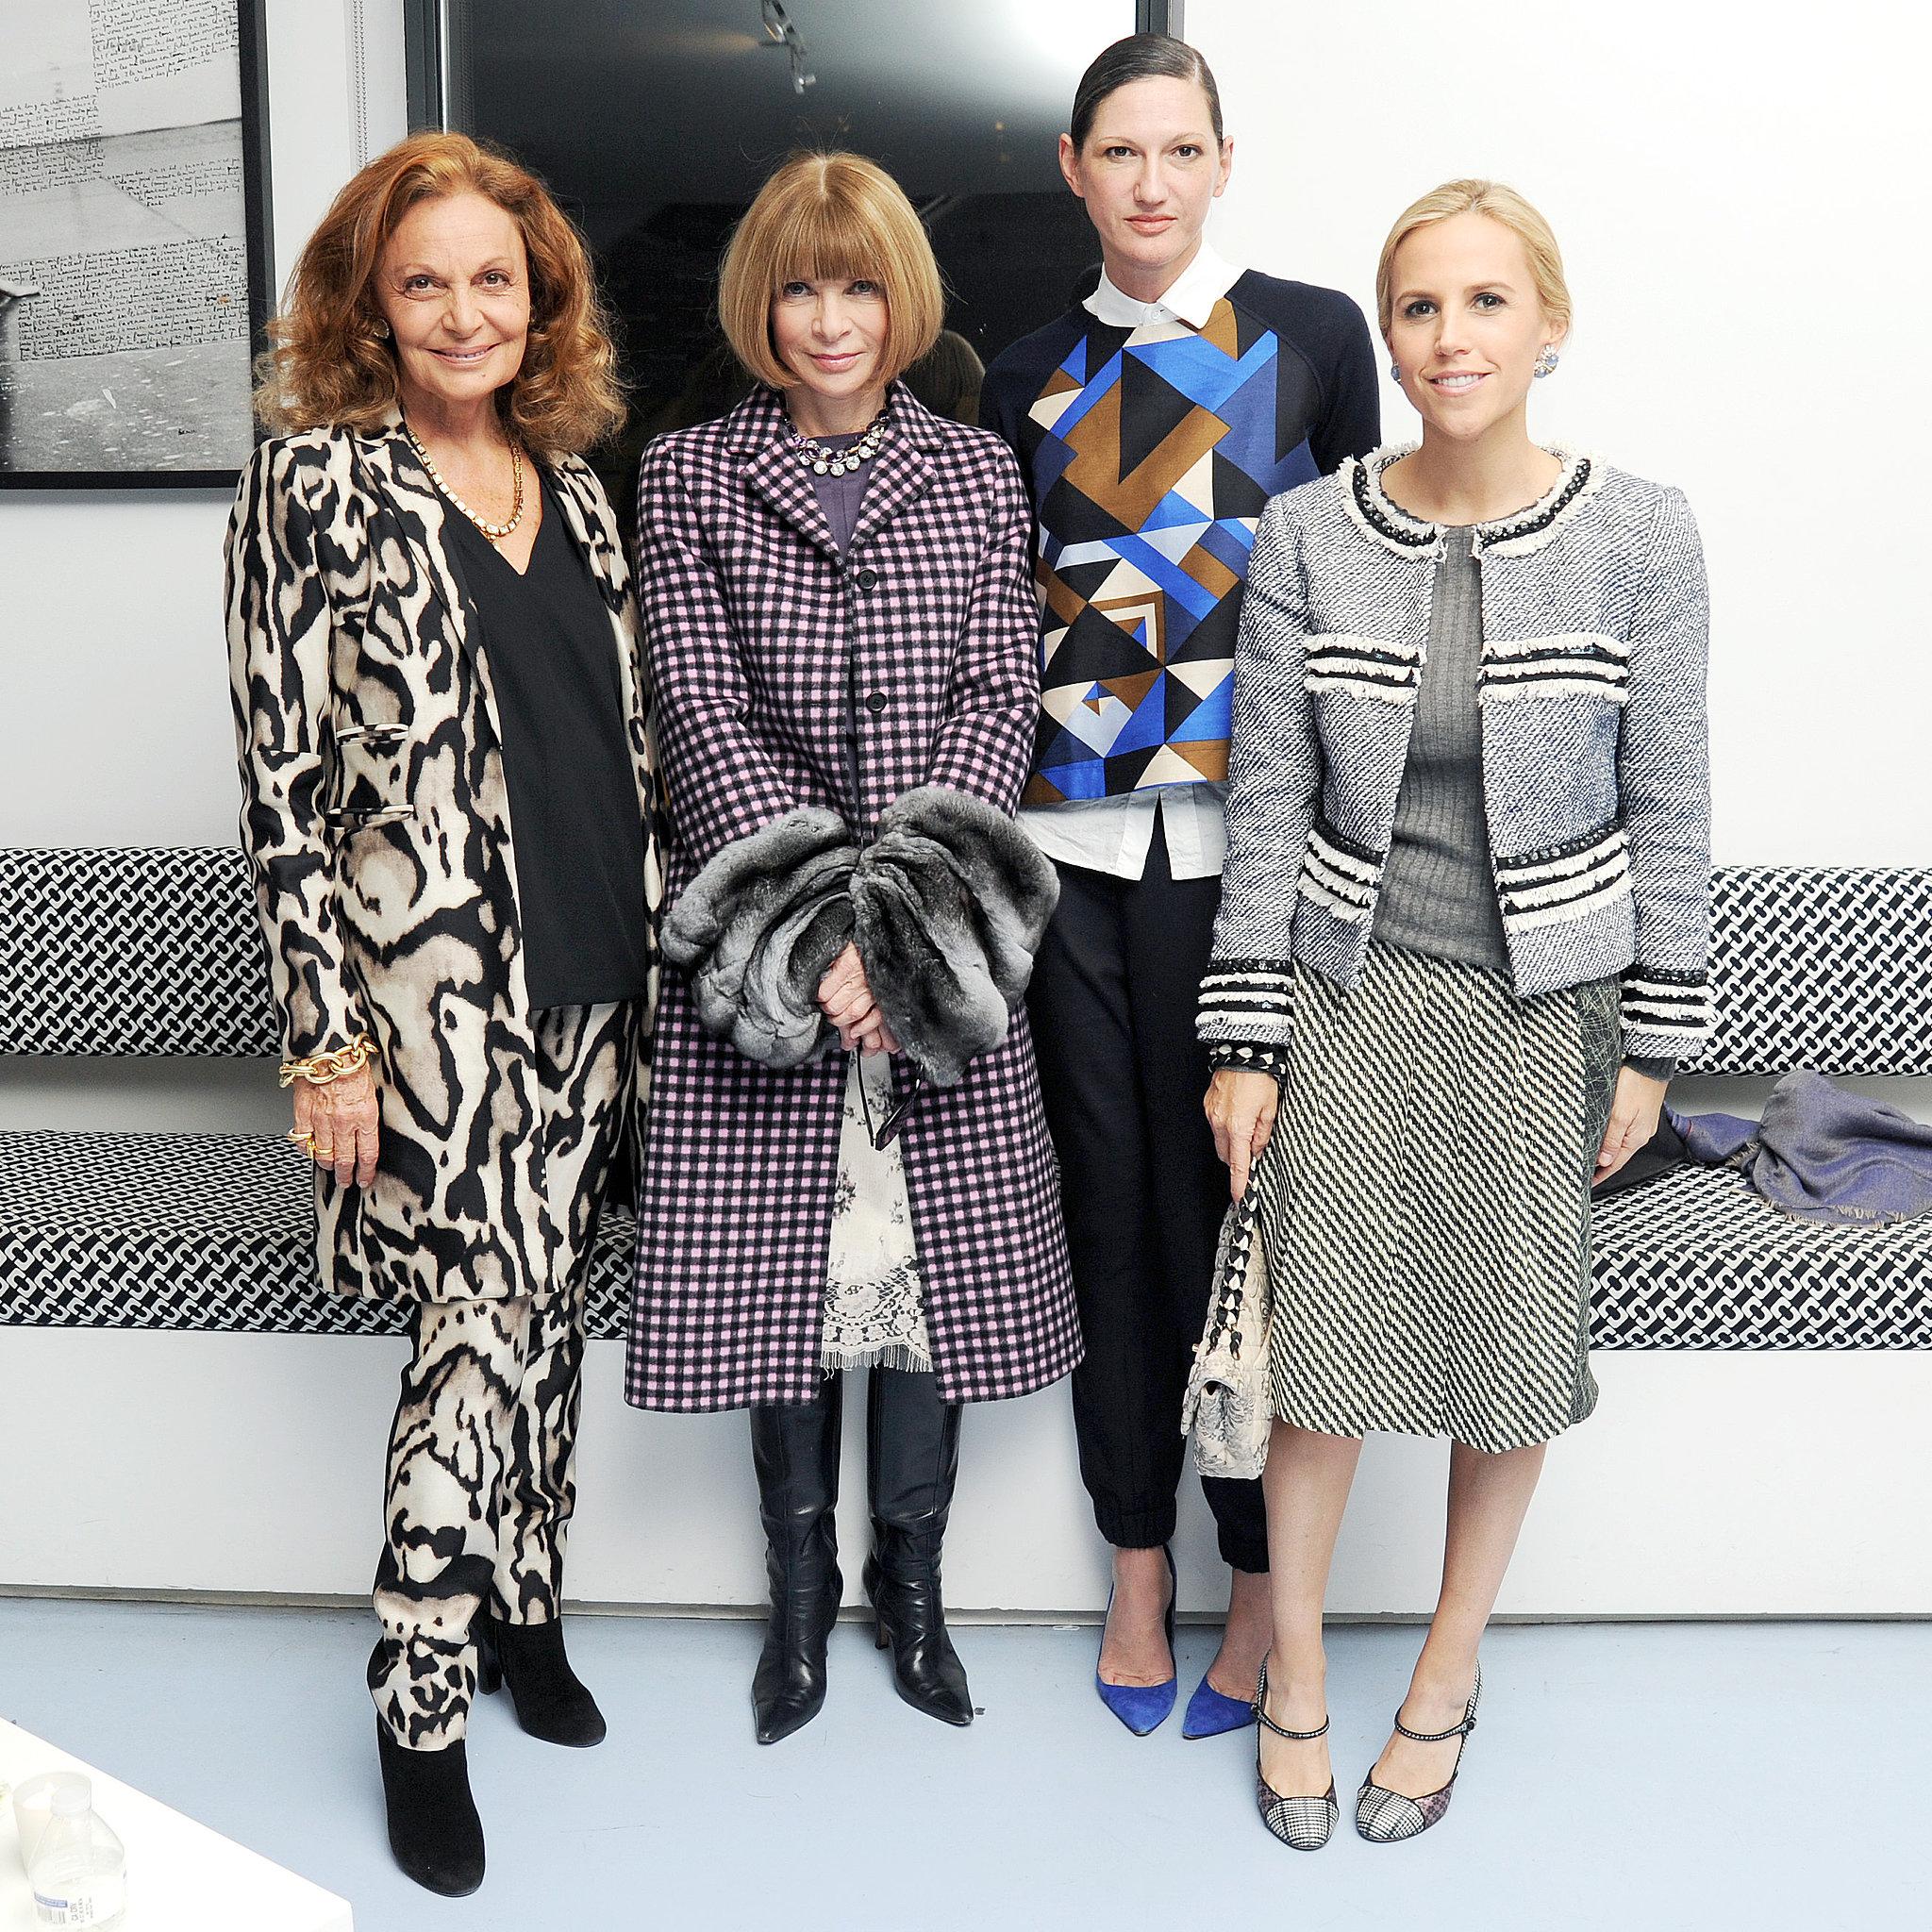 Diane von Furstenberg, Anna Wintour, Jenna Lyons, and Tory Burch at the Bornfree campaign press announcement.